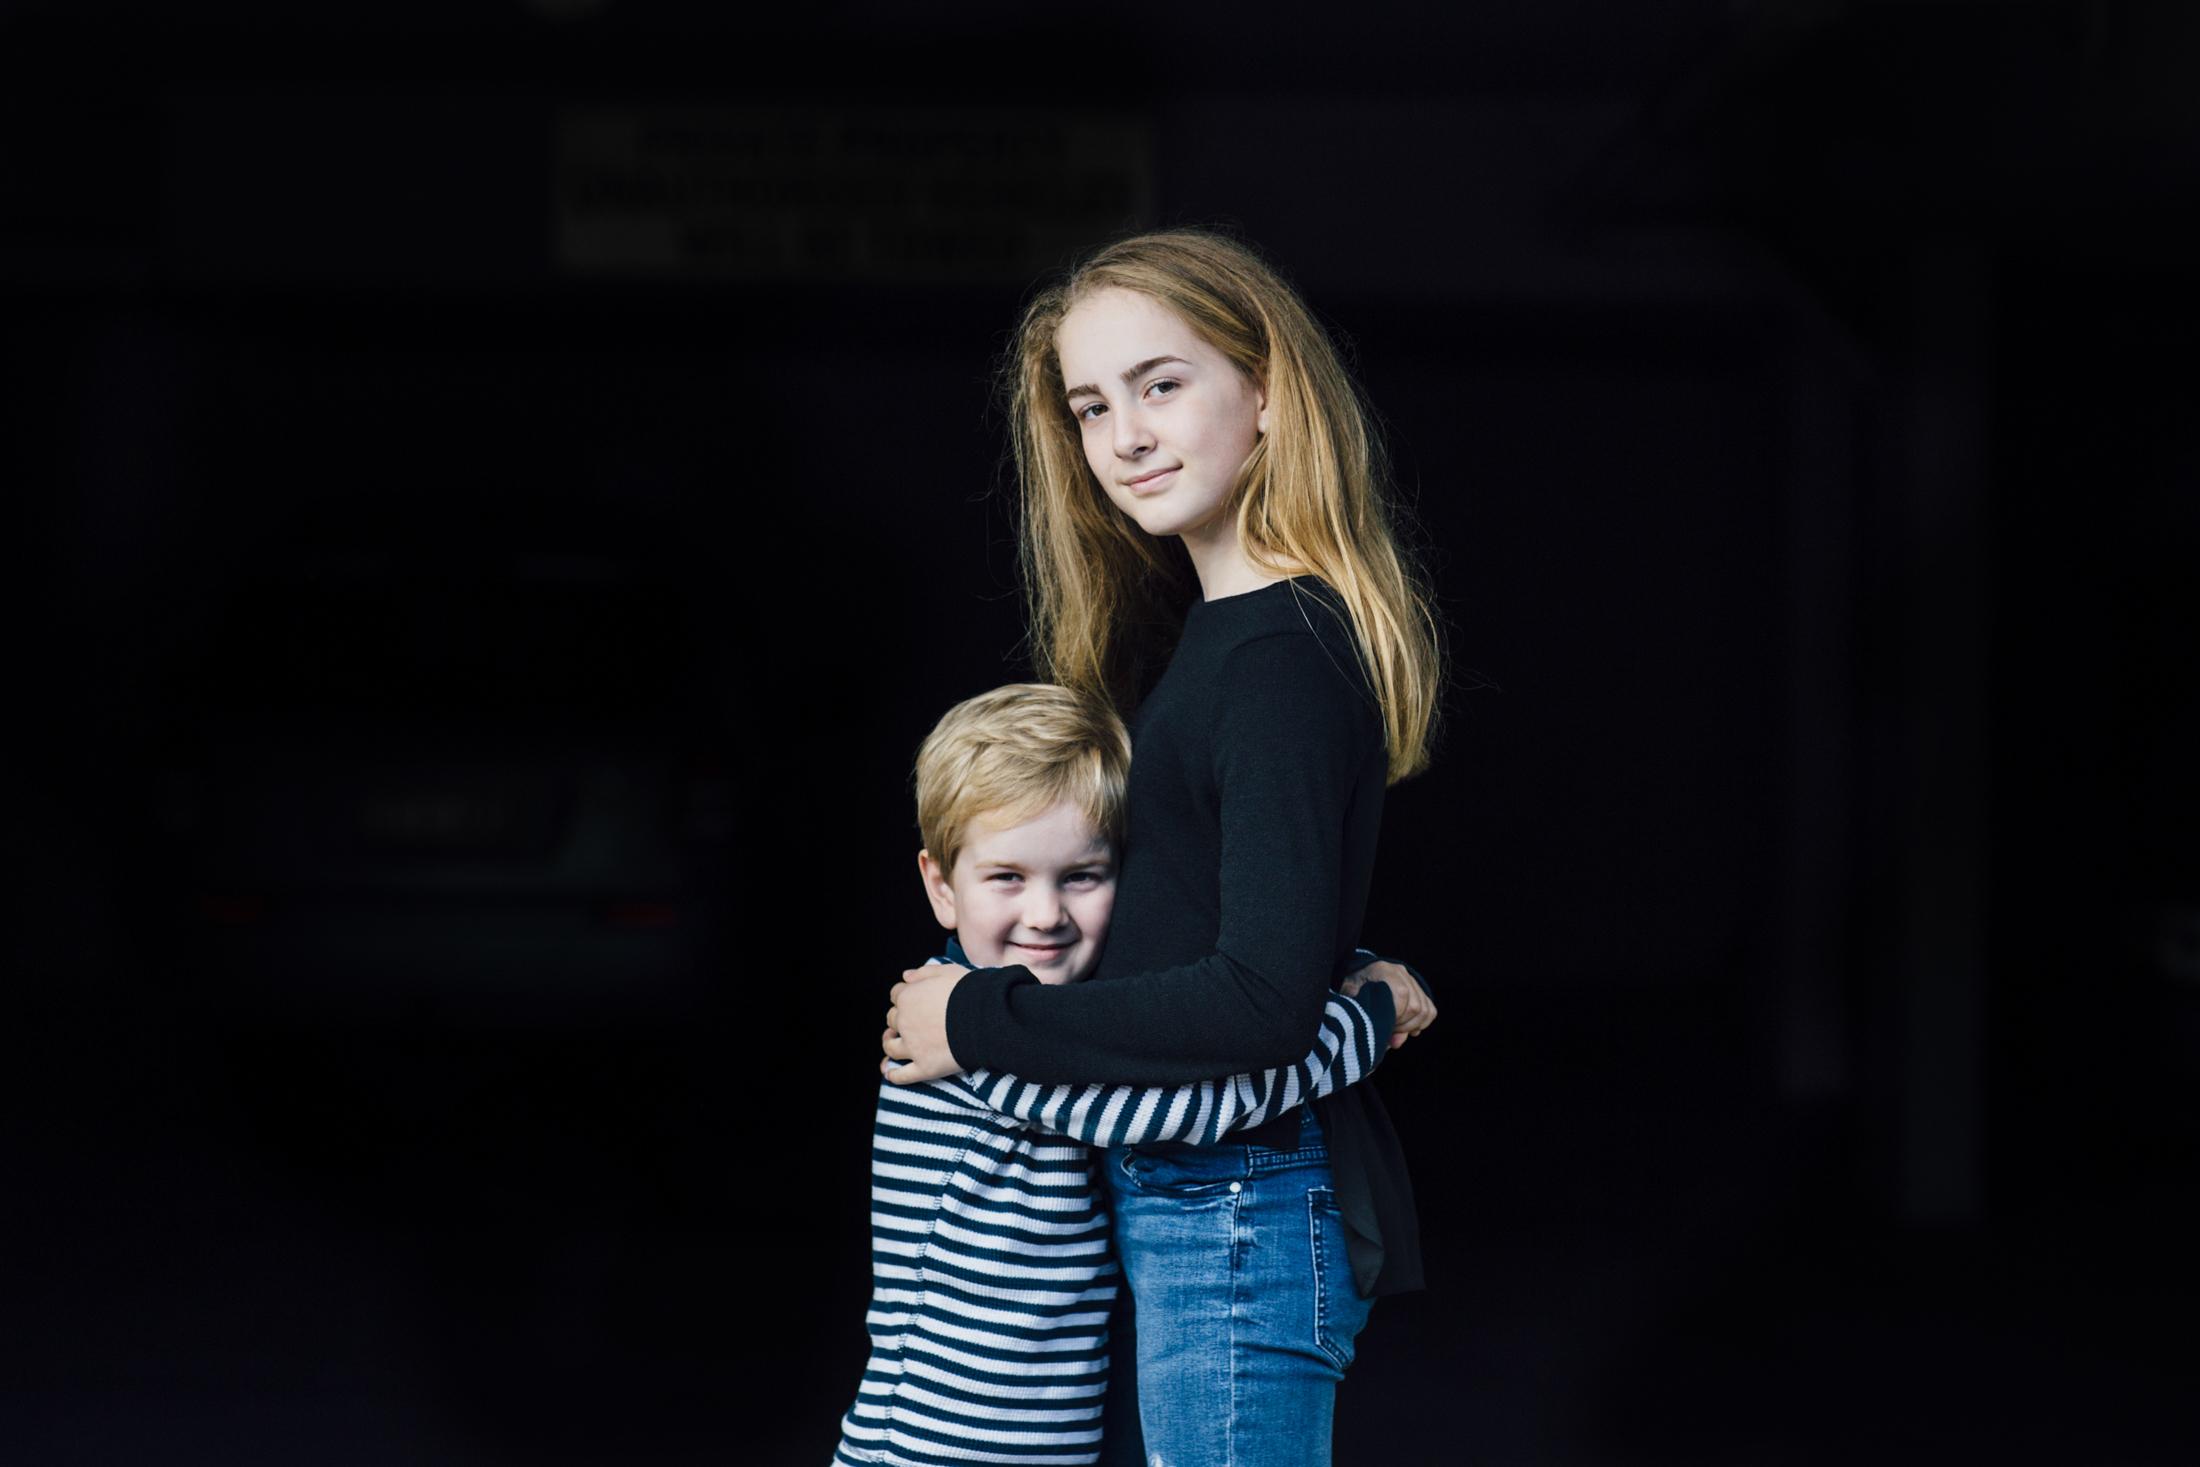 mark_taylor_sydney_family_photography_morffew-5.jpg